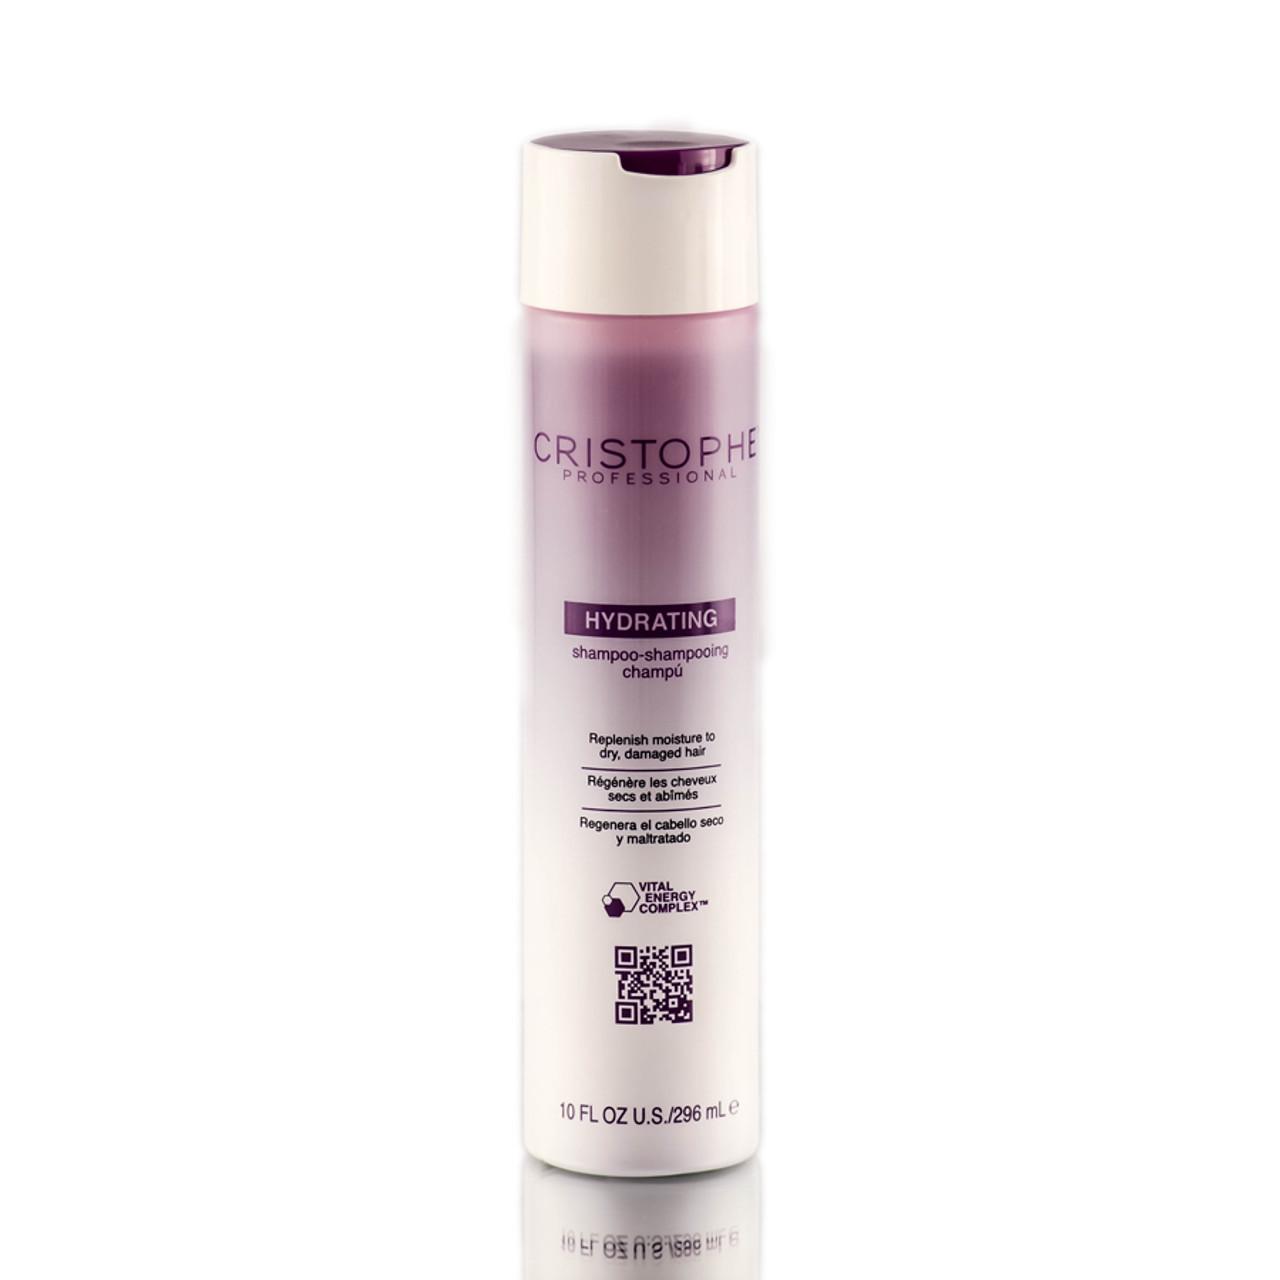 Cristophe professional hydrating shampoo for Cristophe salon prices